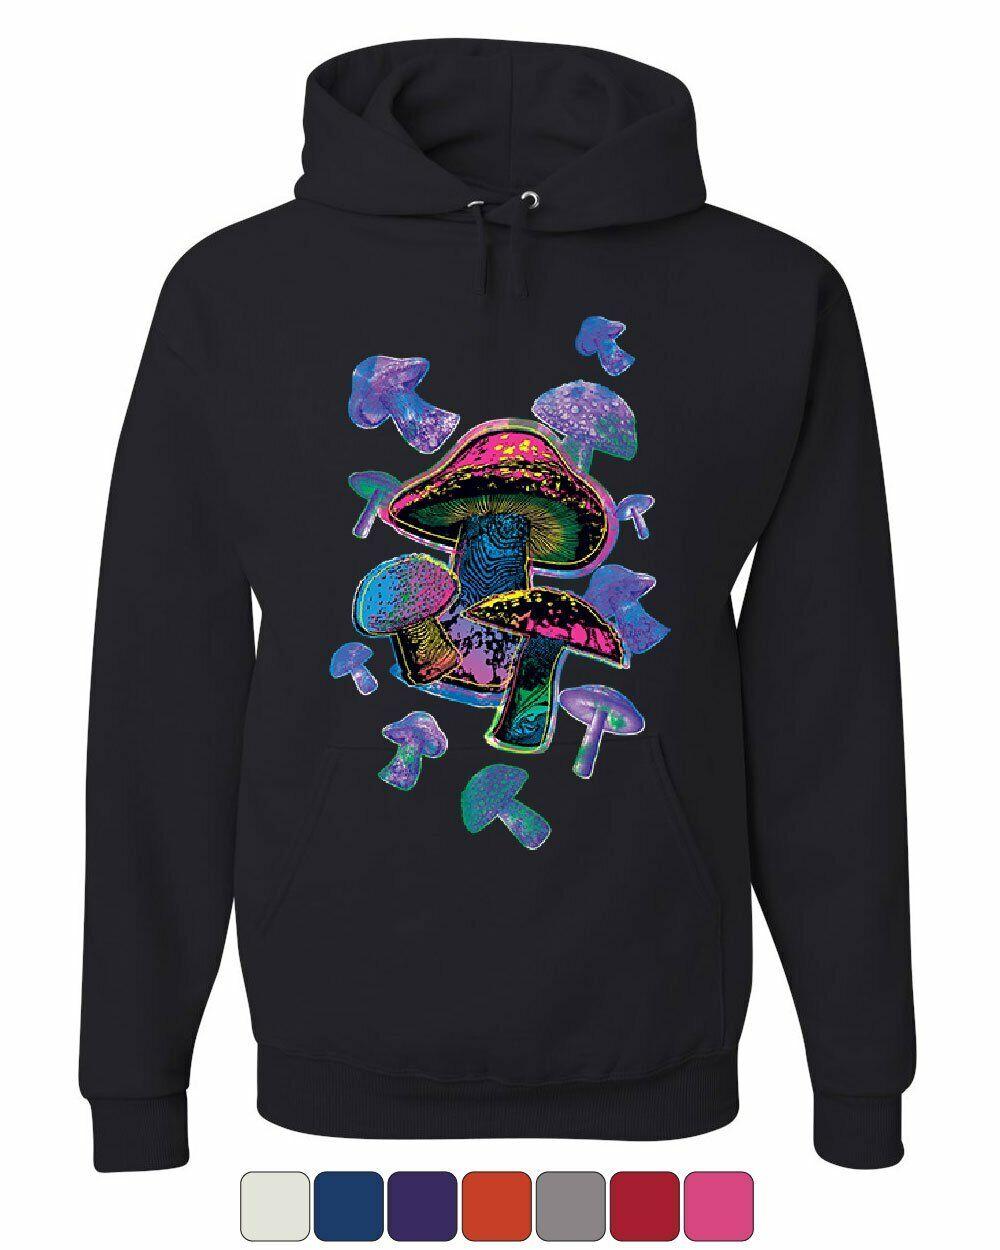 colorful Neon Mushrooms Hoodie Shrooms Psychedelic Psilocybin Sweatshirt